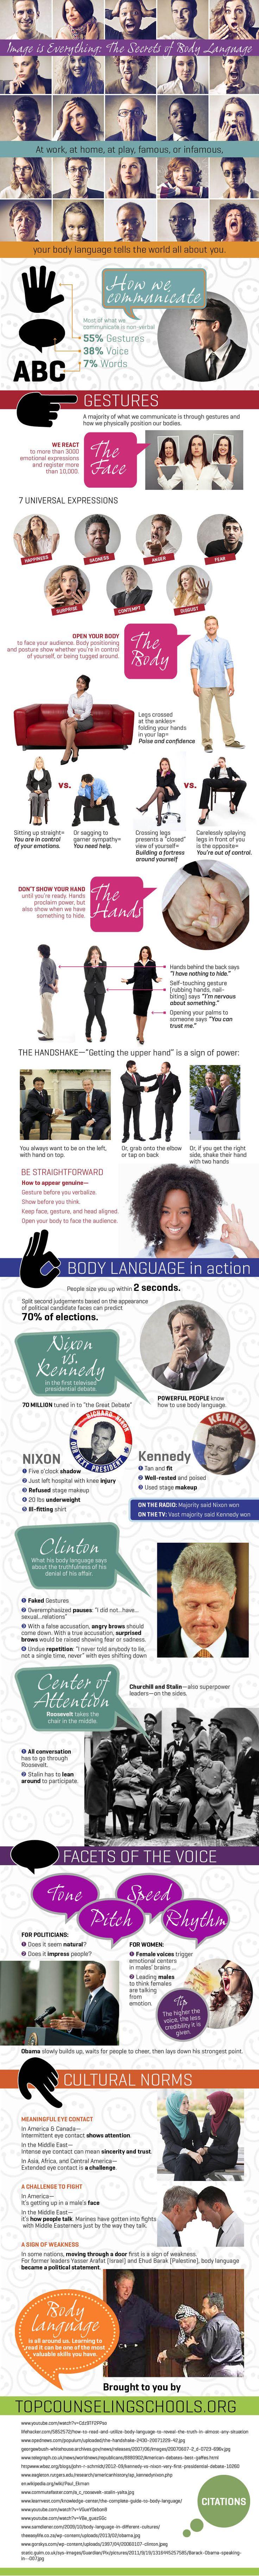 Body Language: An Amazing Infographic